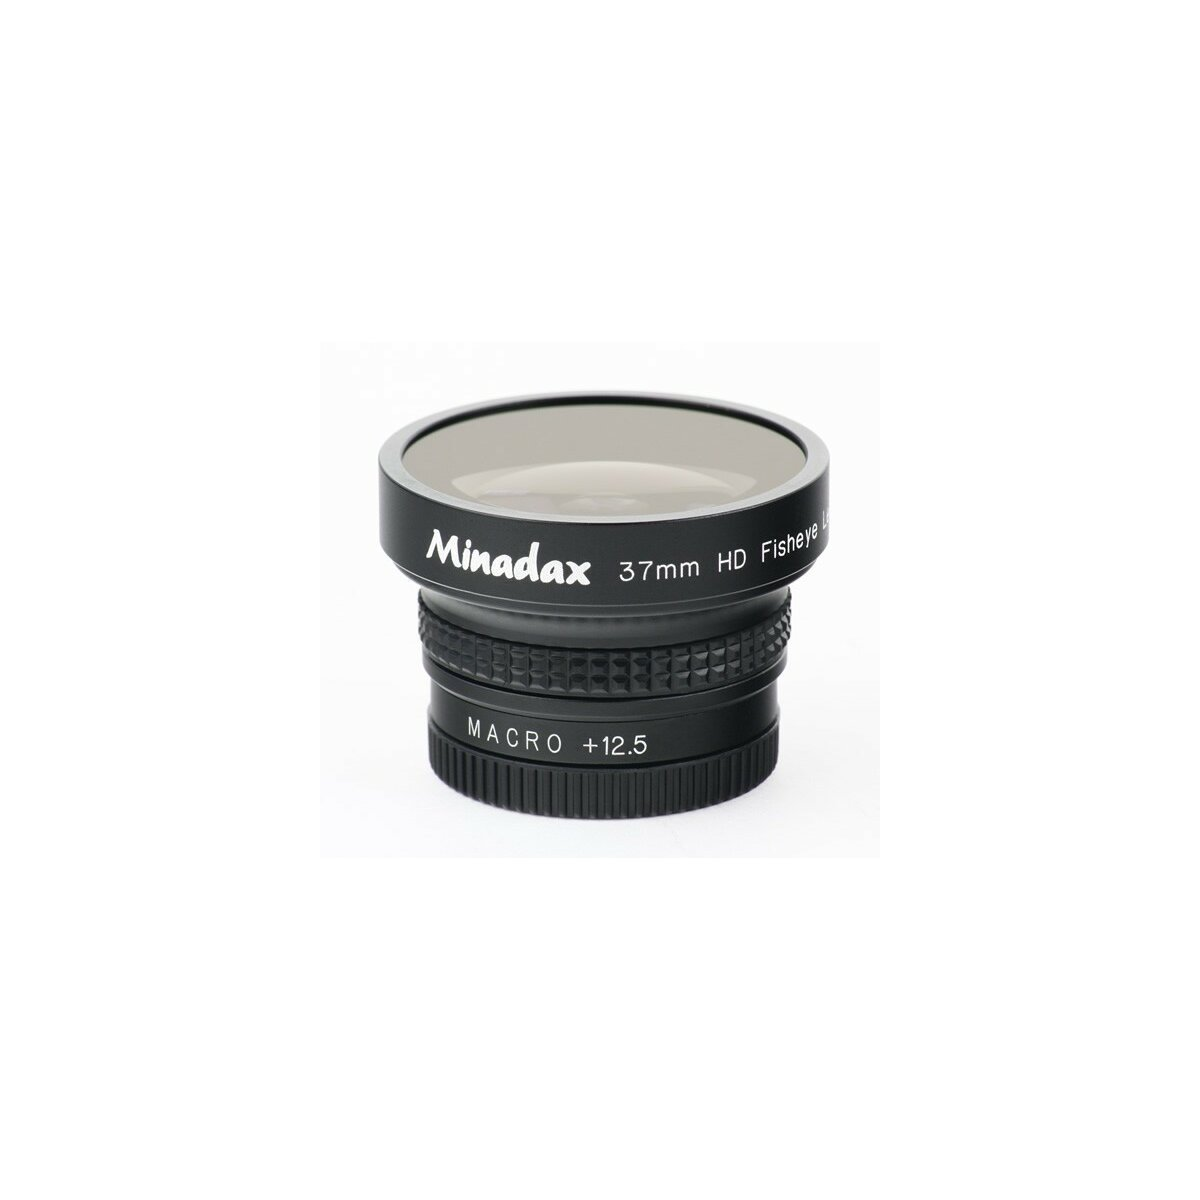 Minadax 0.42x Fisheye Vorsatz kompatibel mit Sony HDR-CX6, HDR-CX11, HDR-CX505, HDR-CX520, HDR-CX550, HDR-UX3, HDR-UX7, HDR-SR5, HDR-SR7, HDR-SR8, HDR-SR11, HDR-SR12, HDR-HC1, HDR-HC5, HDR-HC7, HDR-HC9, HDR-XR500, HDR-XR520, HDR-XR550, DCR-HC85